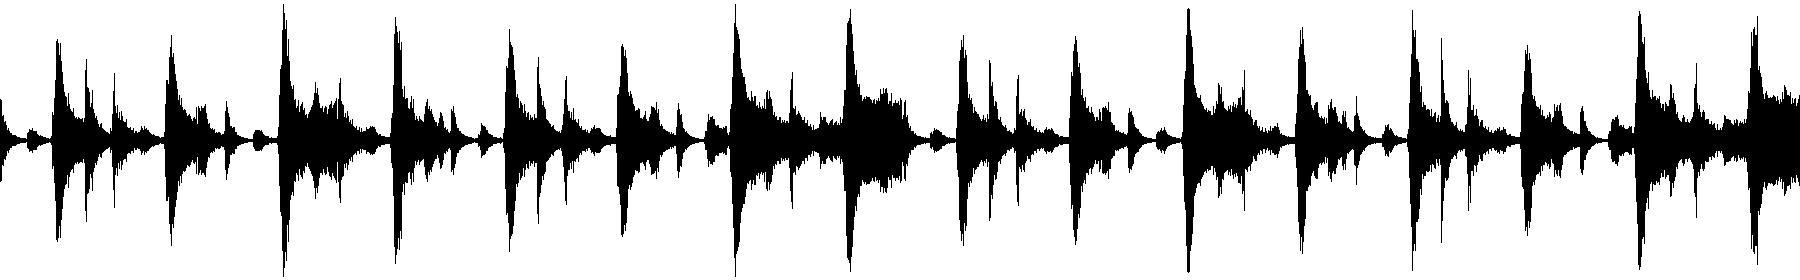 hihatgrooves 128bpm